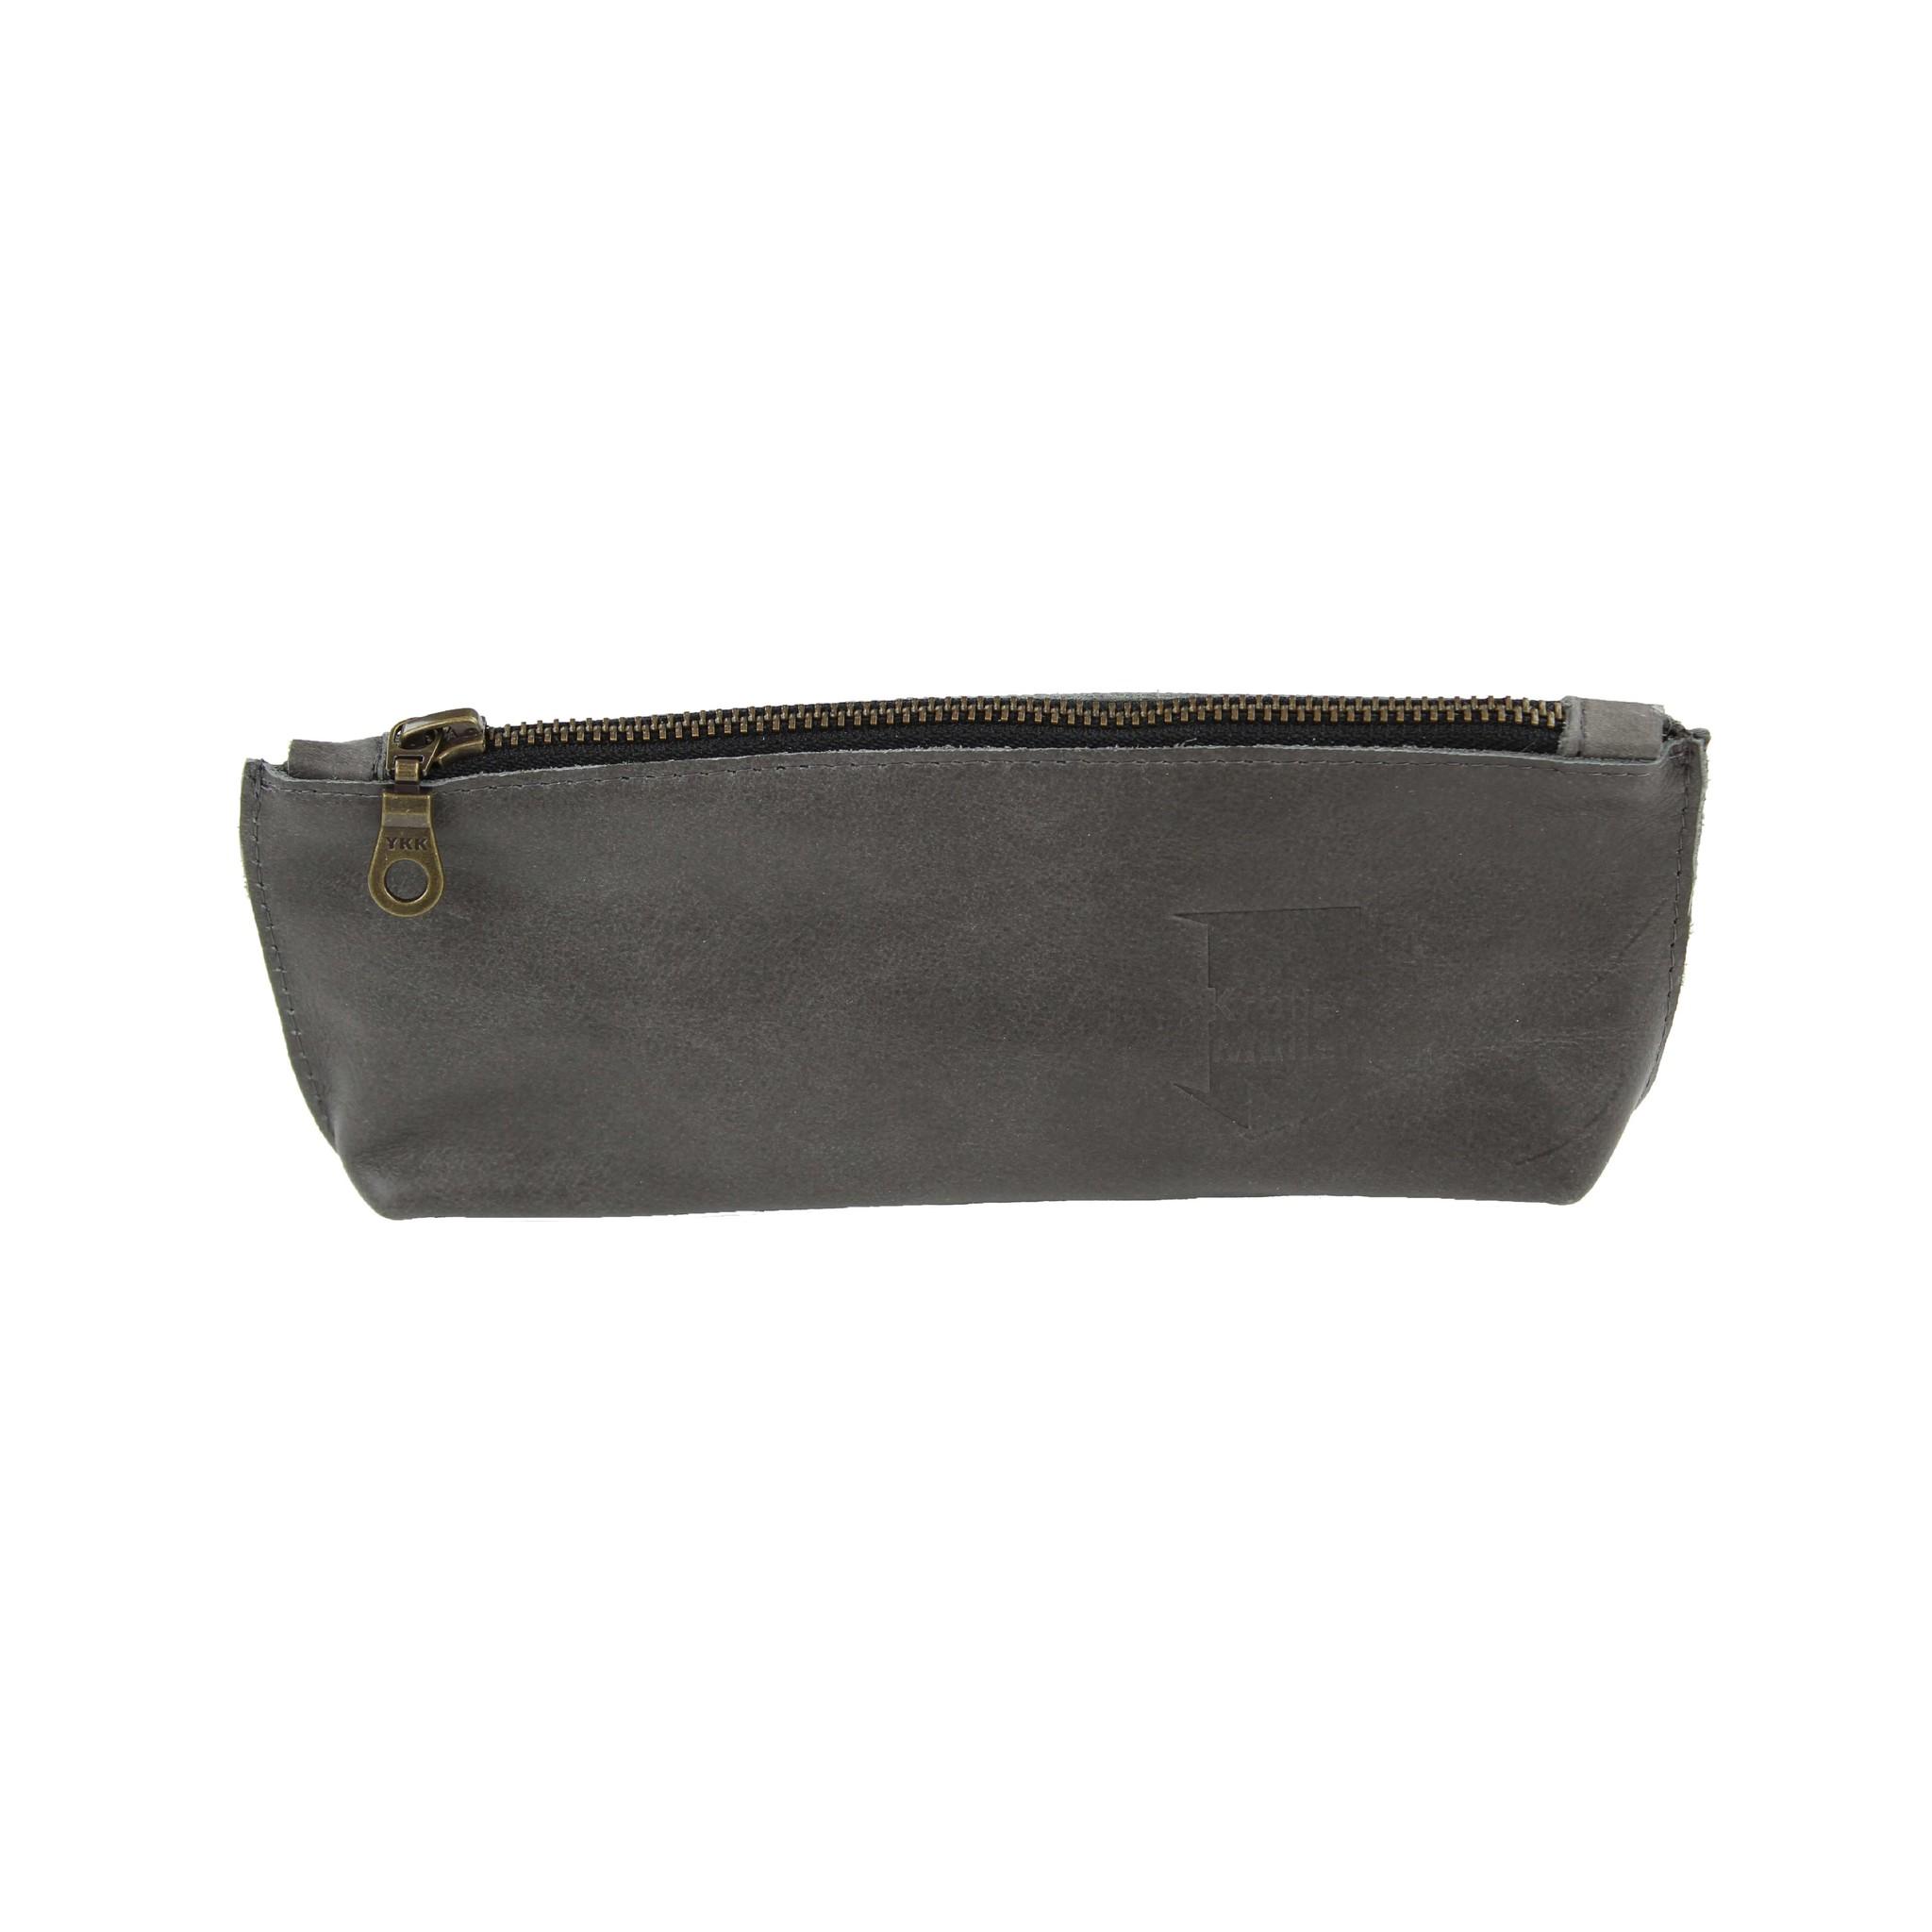 Etui leather grey